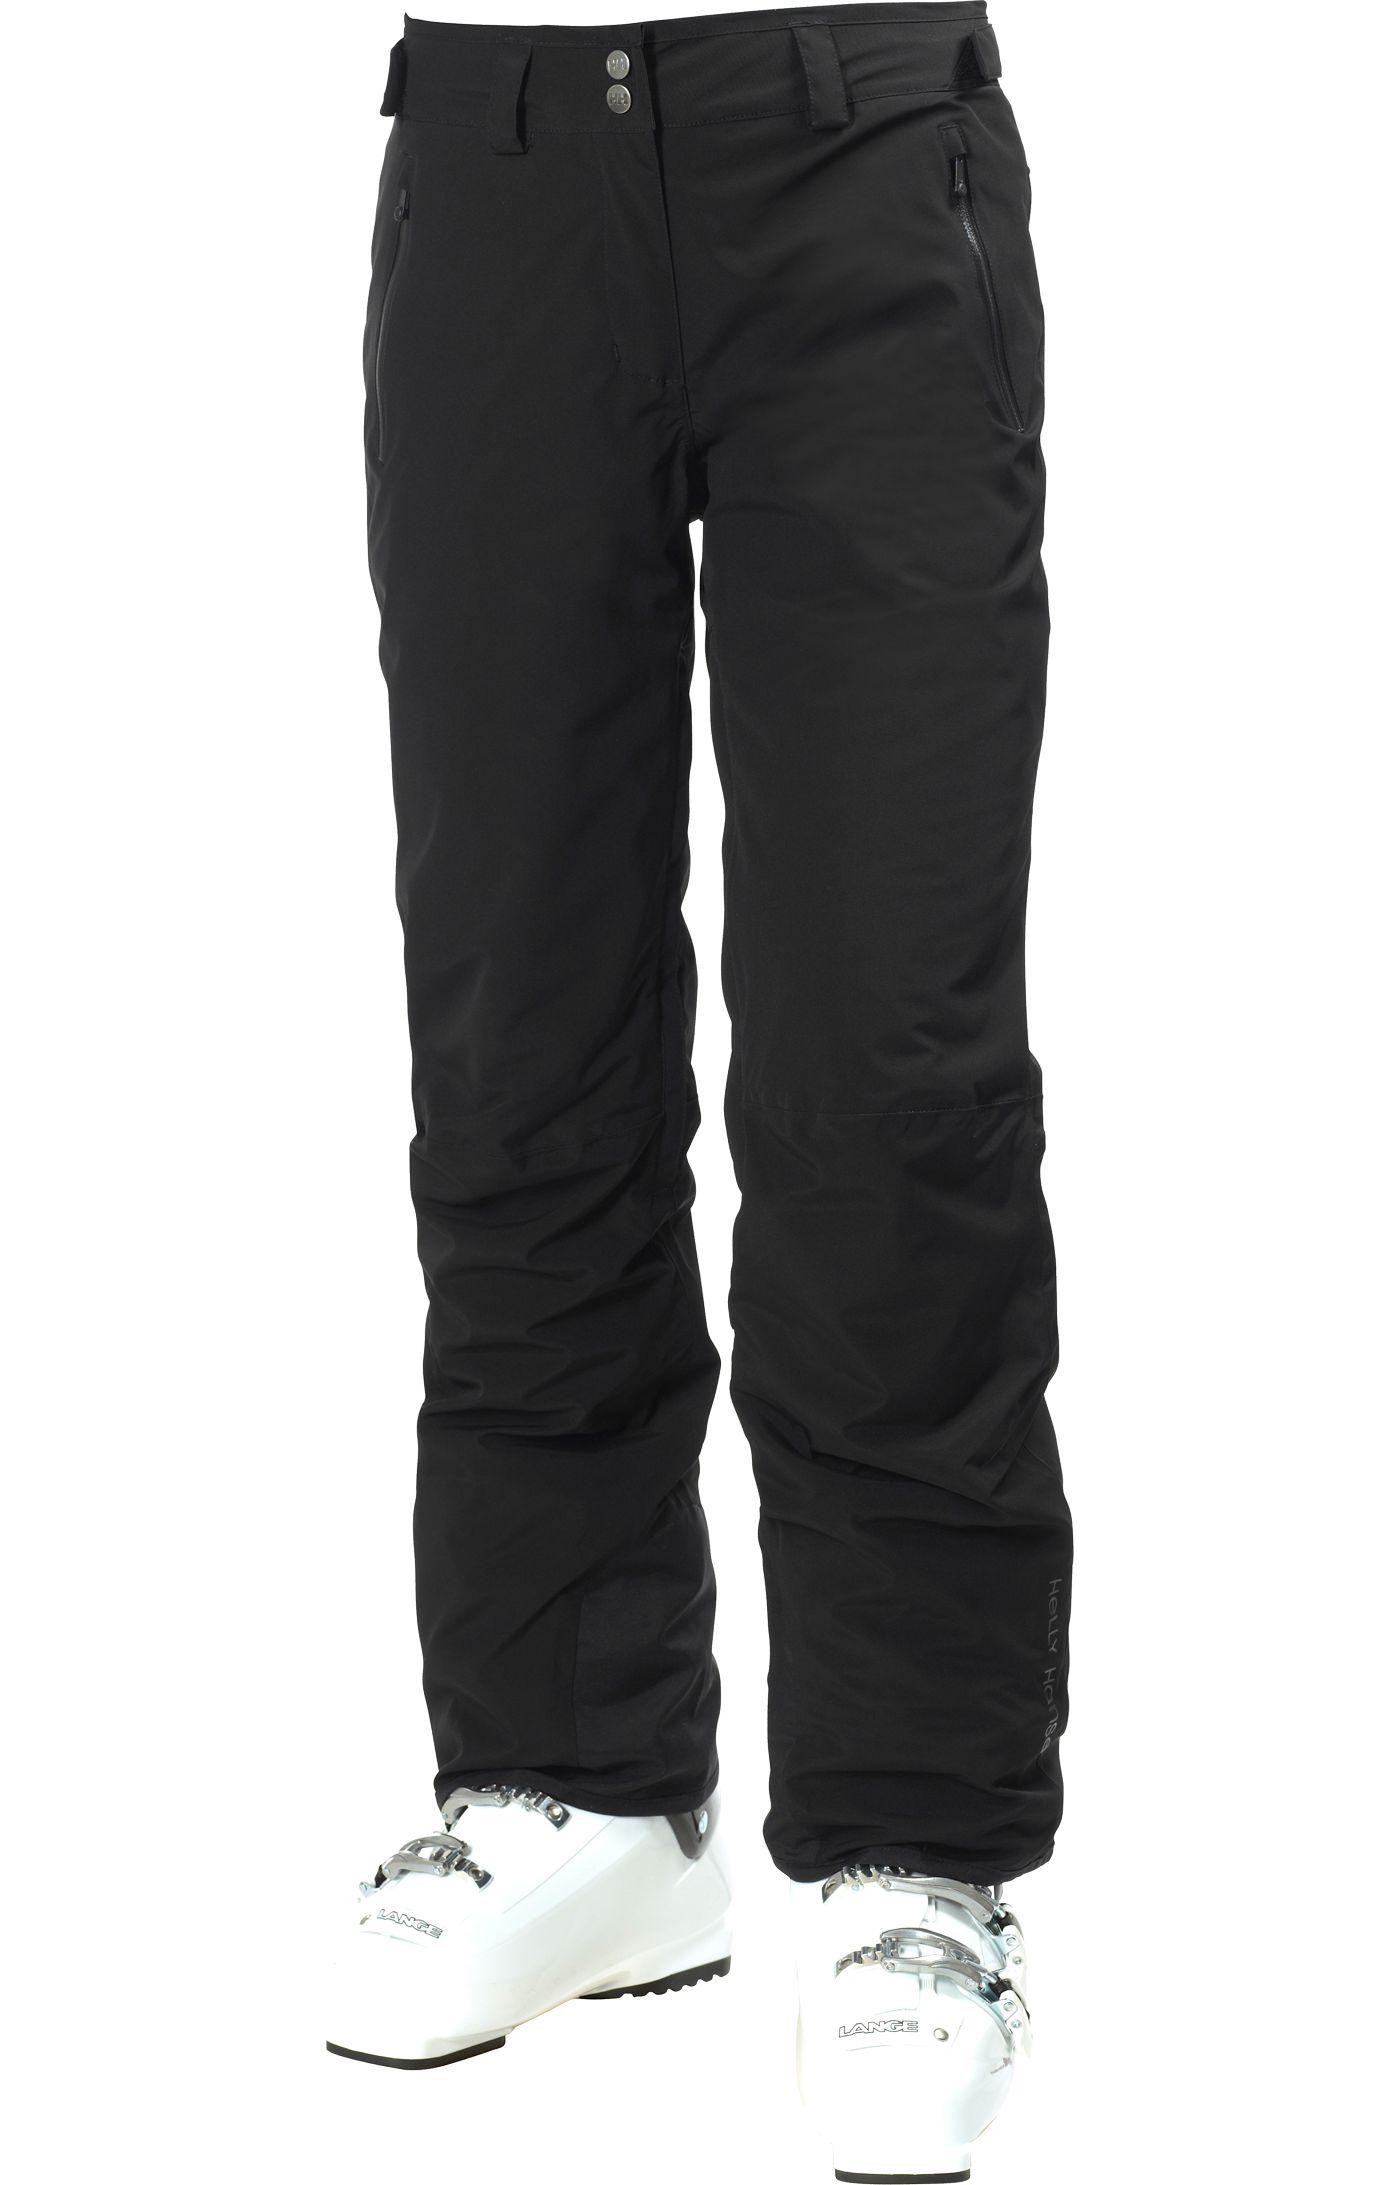 Helly Hansen Women's Legendary Insulated Ski Pants